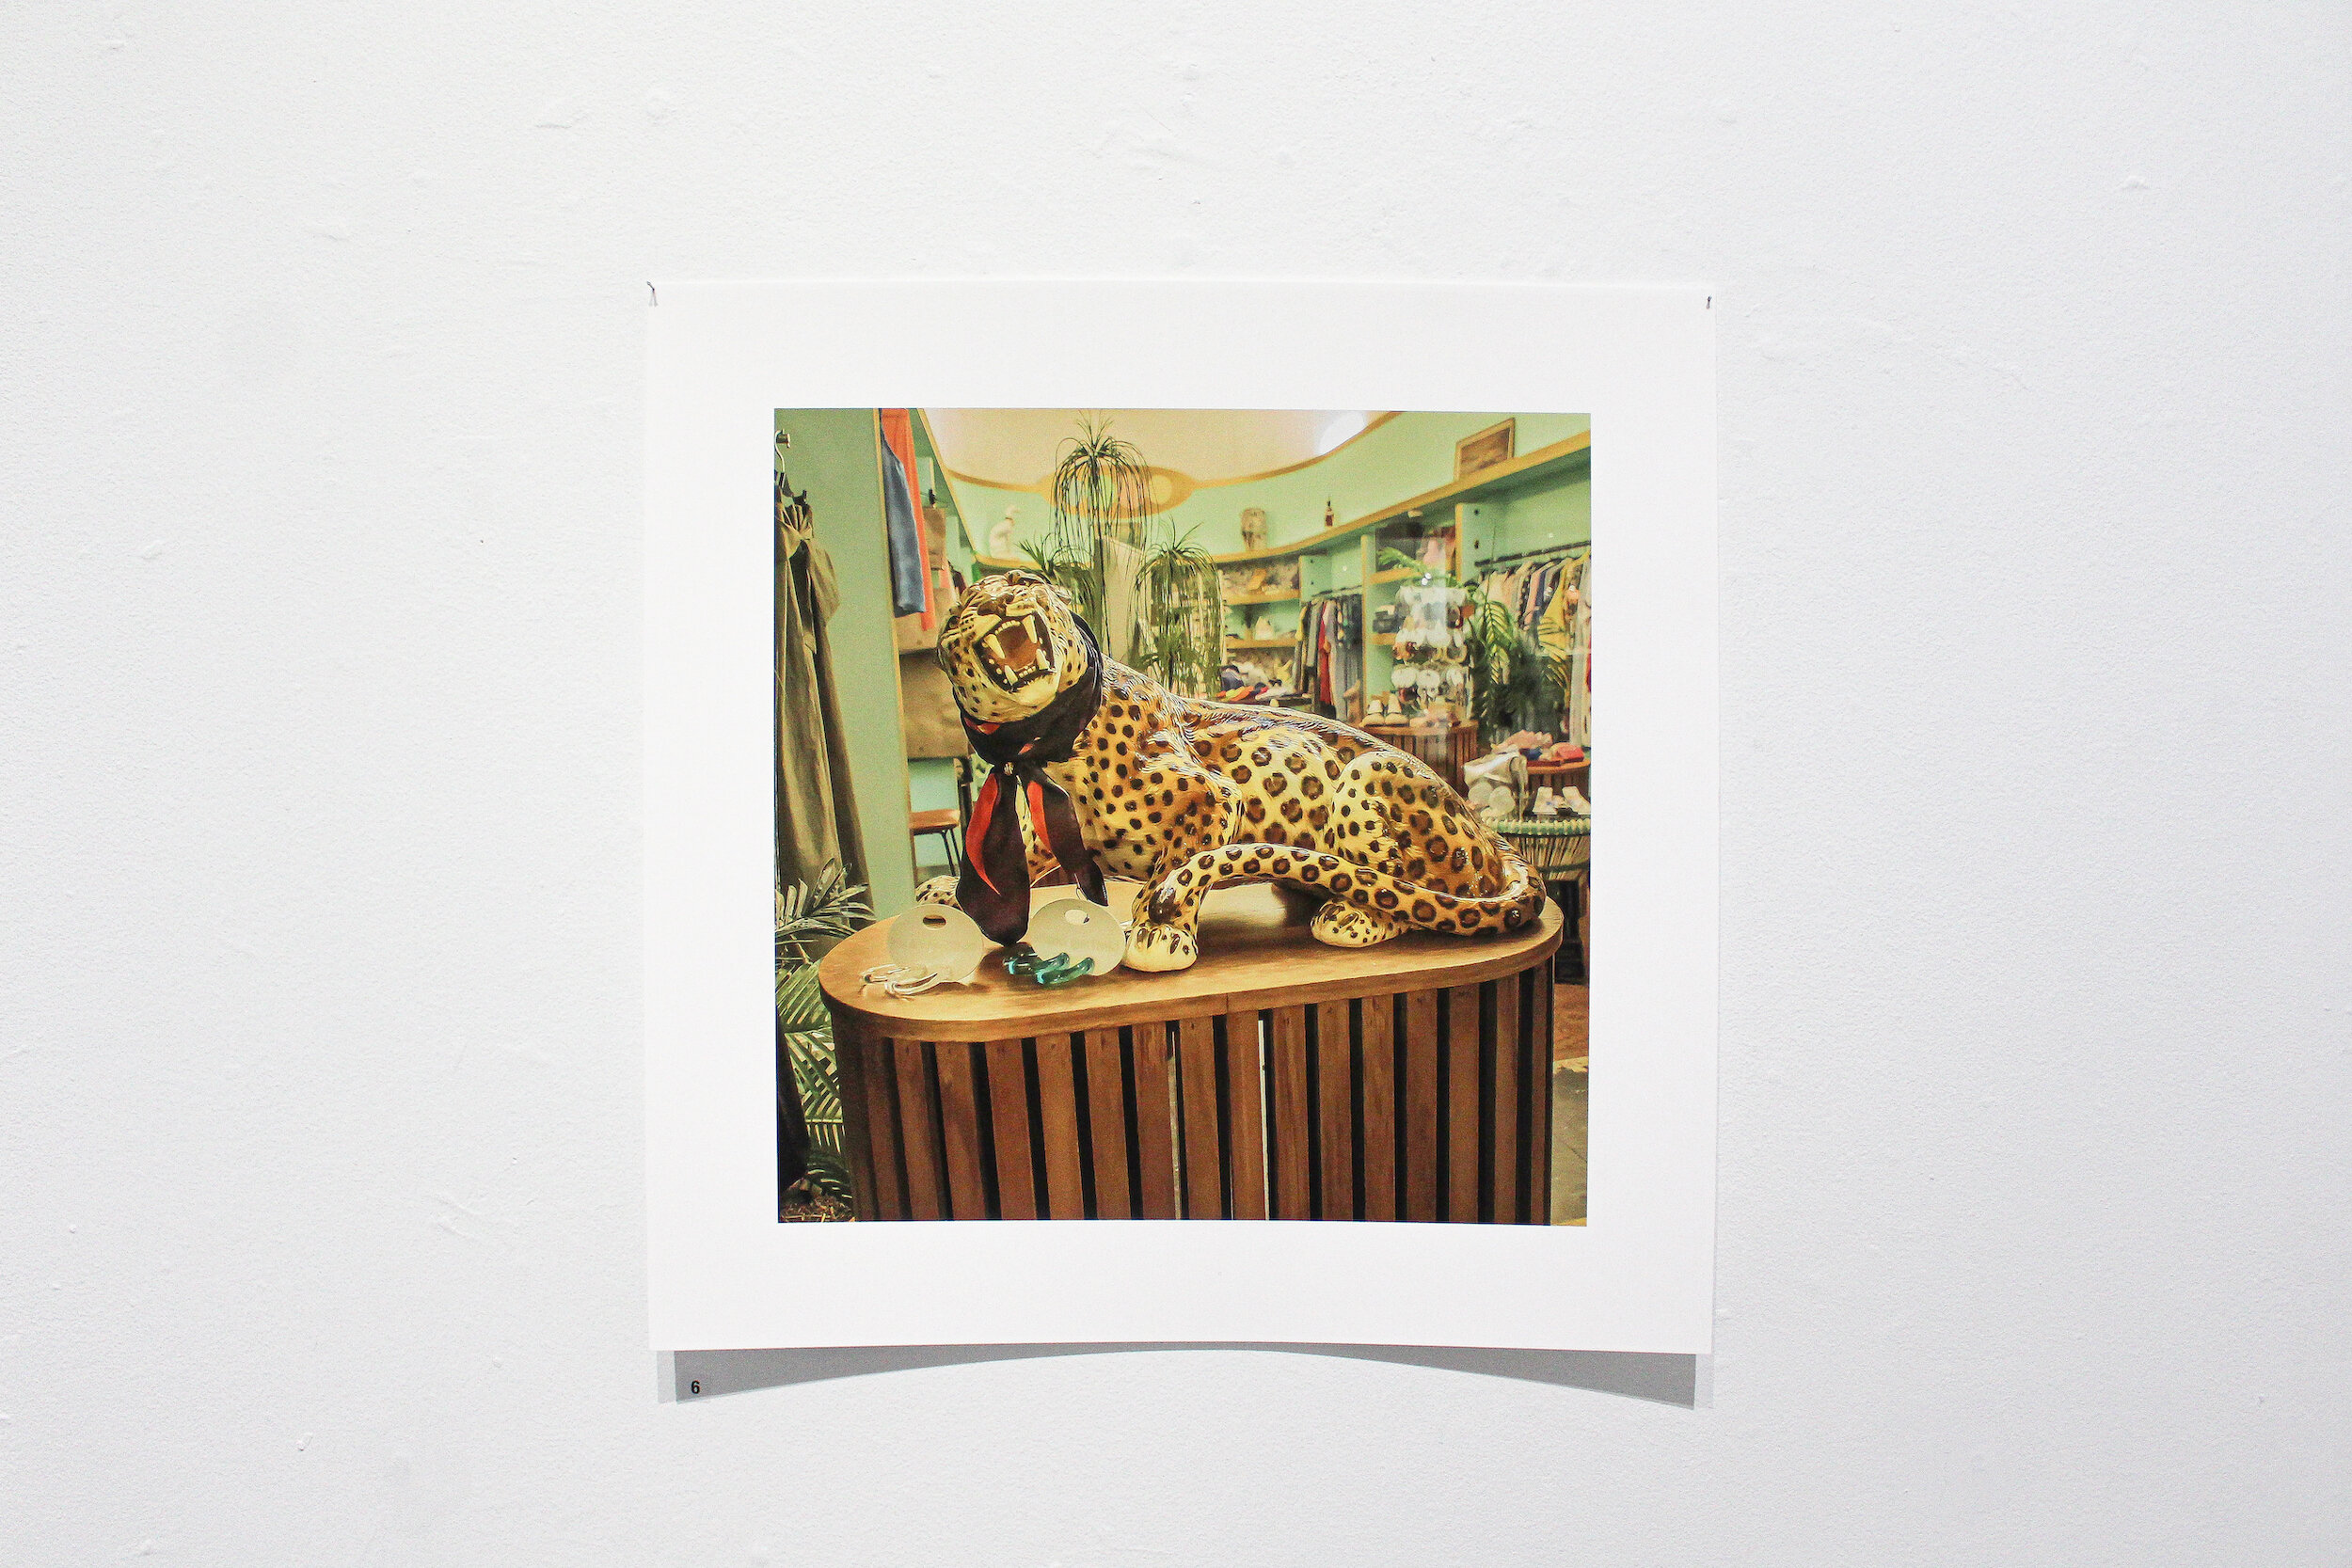 Lindsay Mott,  I will keep strangers away , giclée print, 32 x 32cm